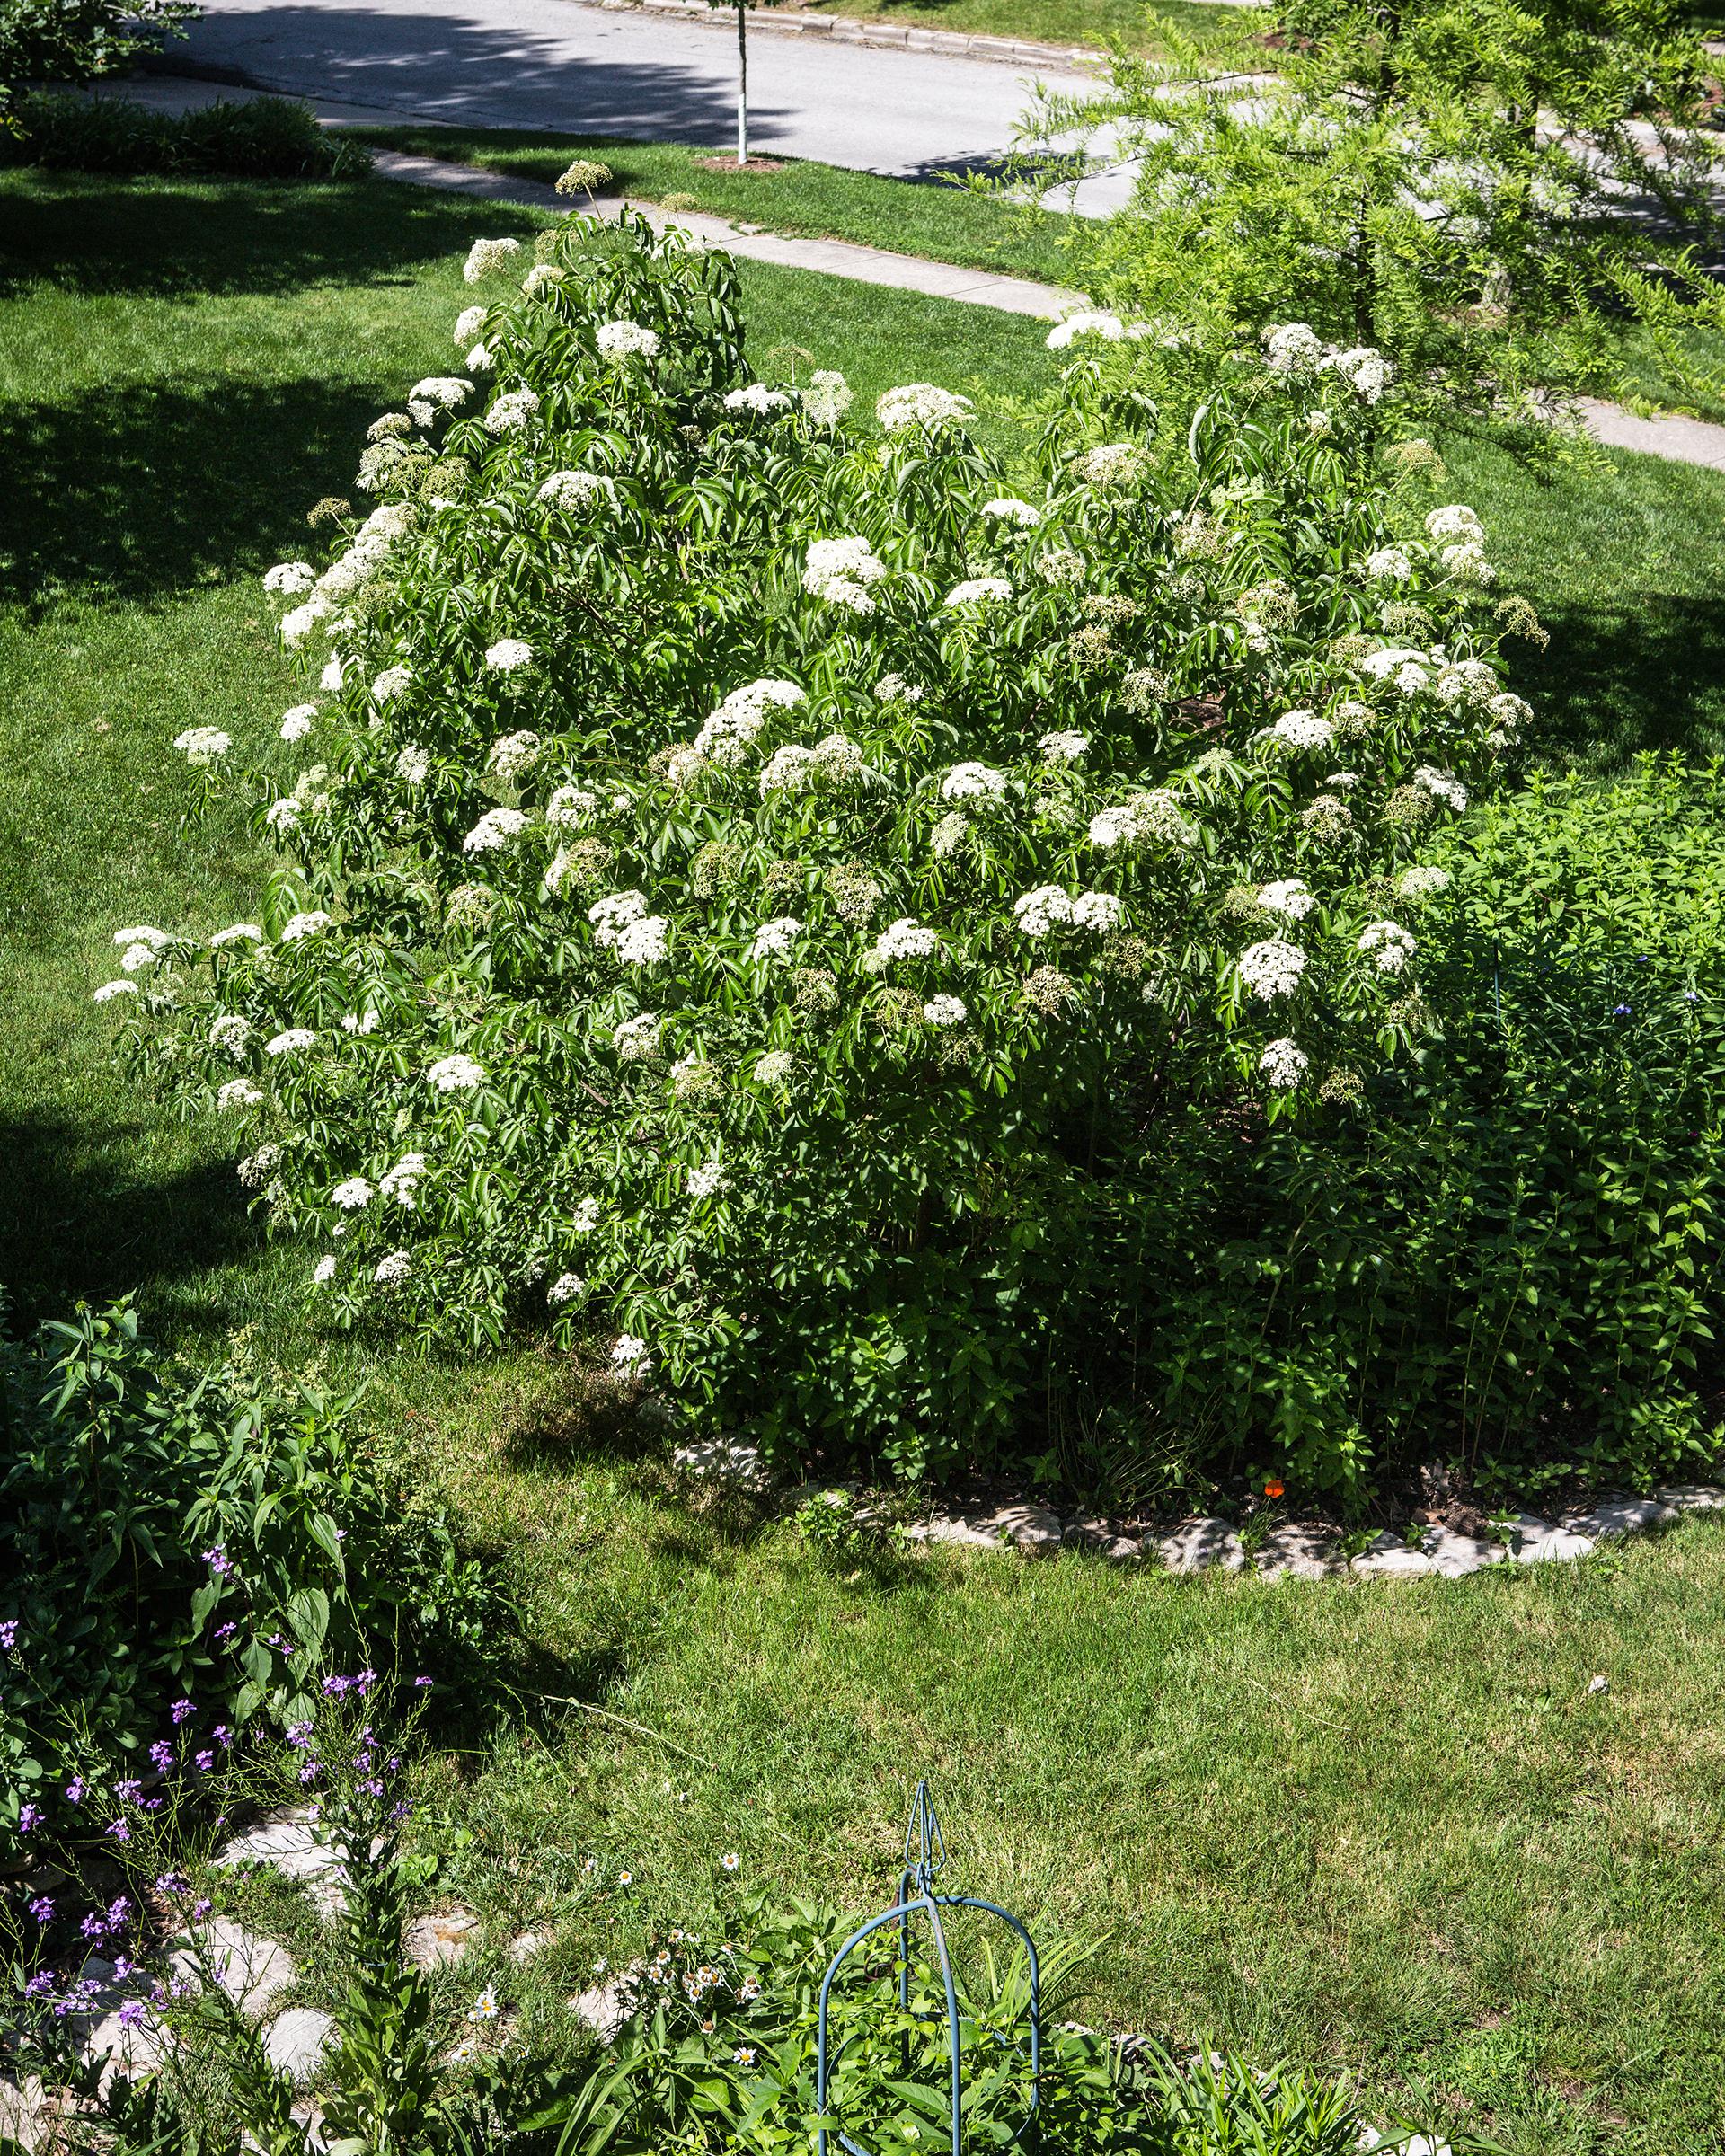 Edible Landscaping with Elderberry | EcoFarming Daily